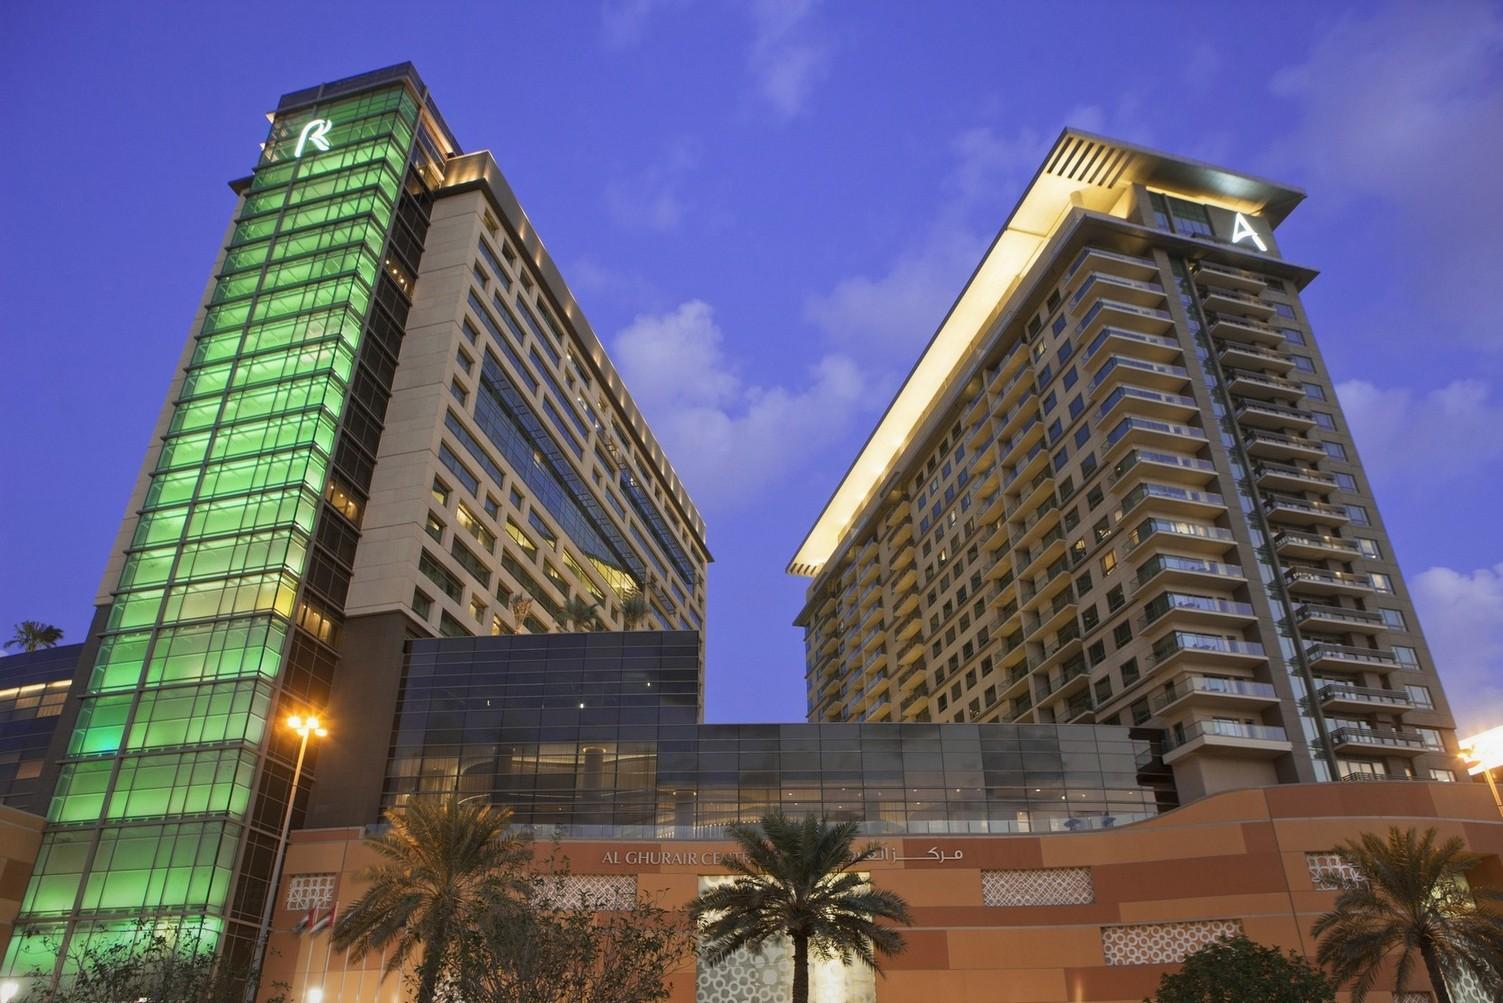 Al Ghurair Rayhaan by Rotana - Dubai 5 Star Hotel